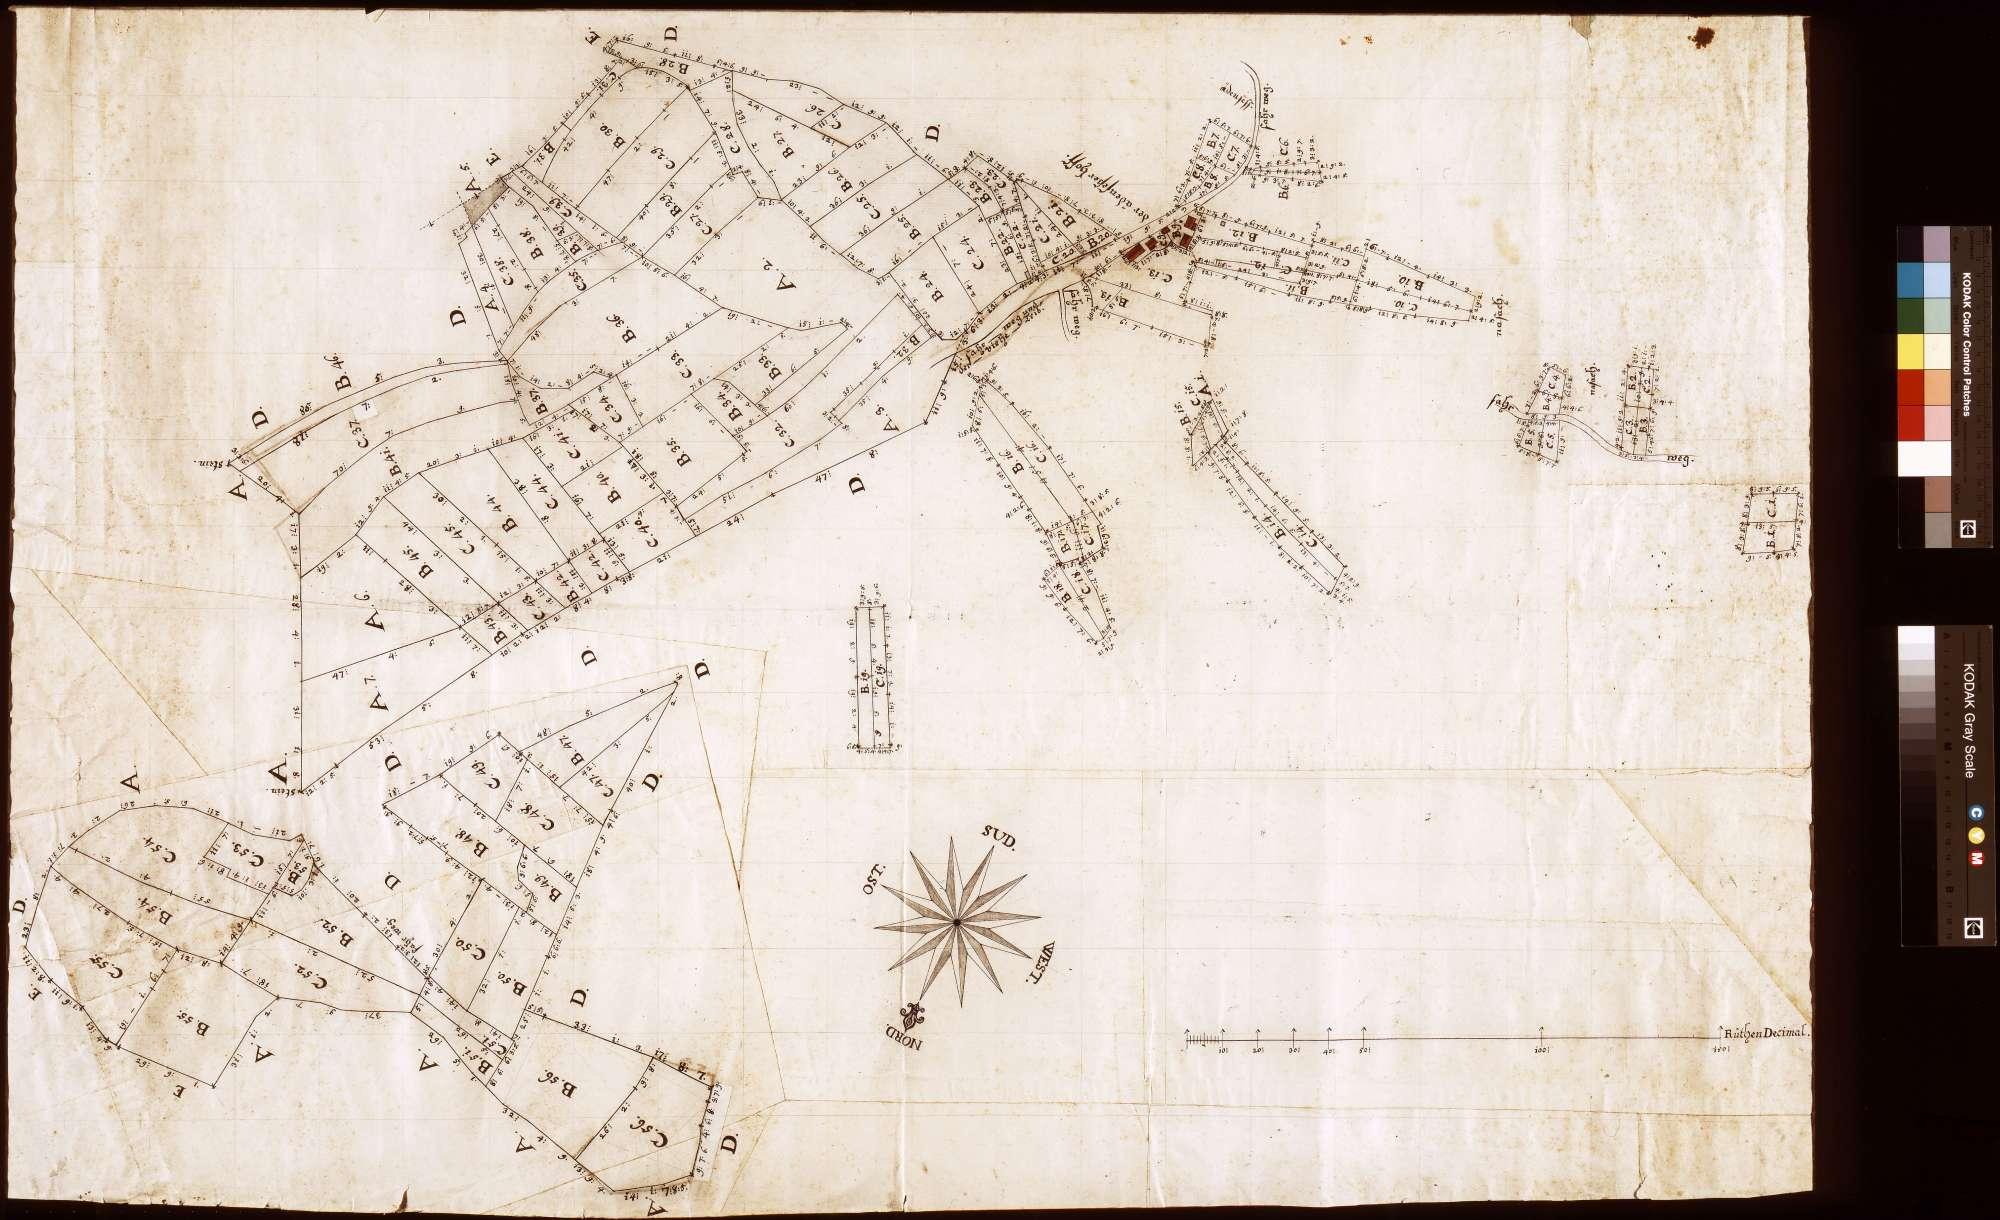 [Gemarkung Ödengesäßer Hof; Teil 1] (Inselkarte), Bild 1